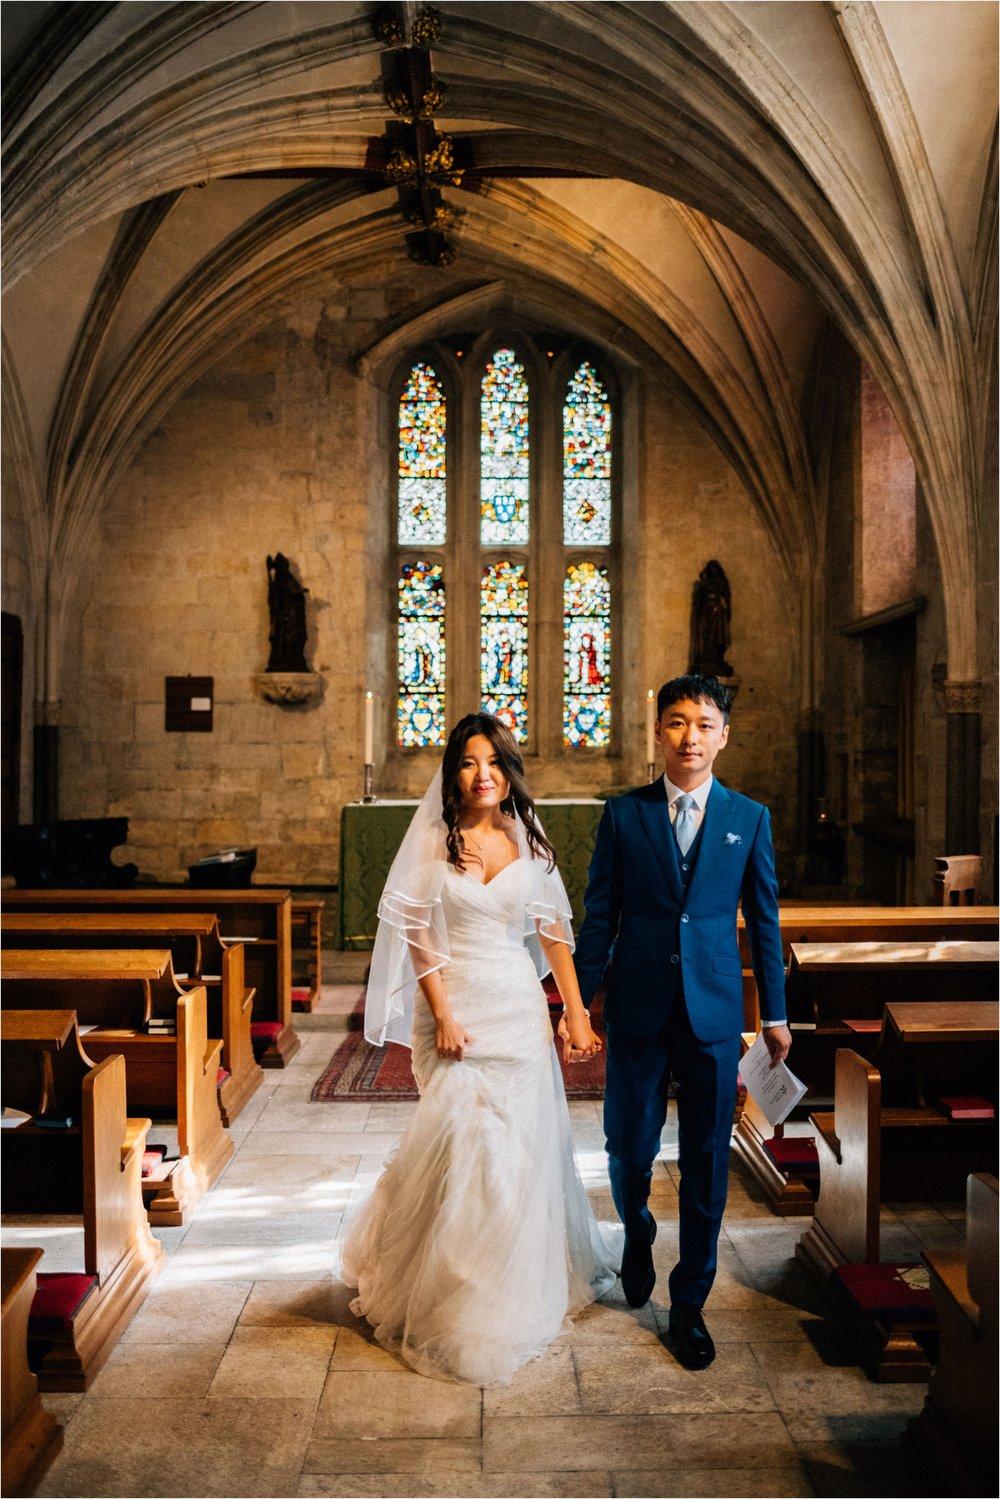 York city elopement wedding photographer_0139.jpg